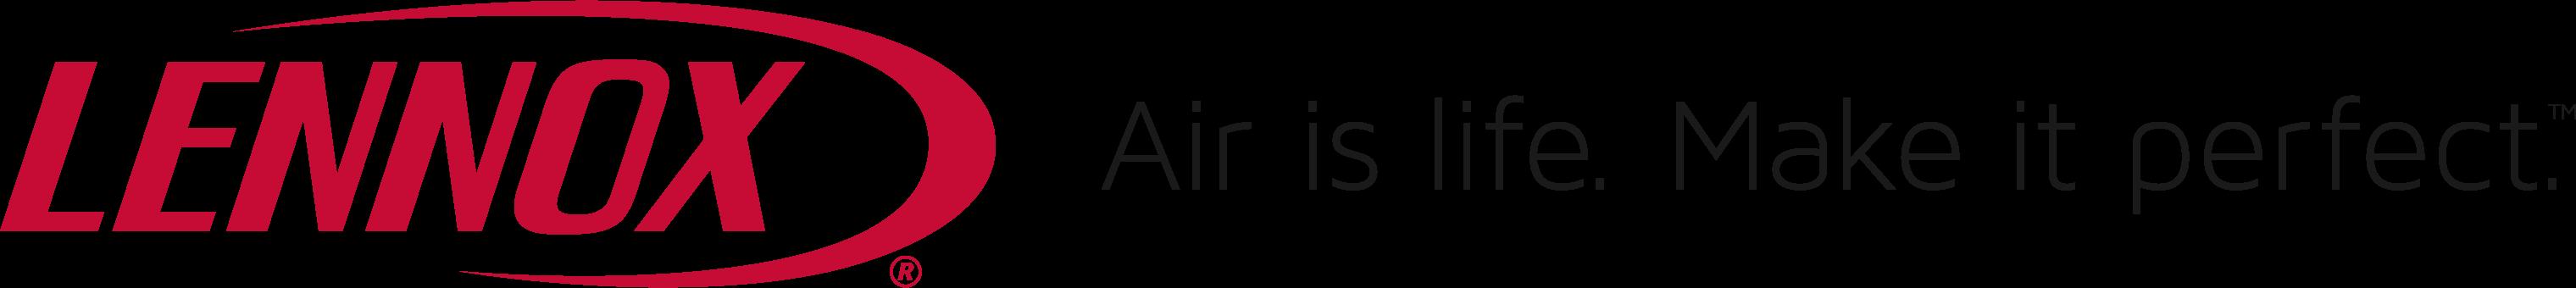 aircontrols billings lennox dealer